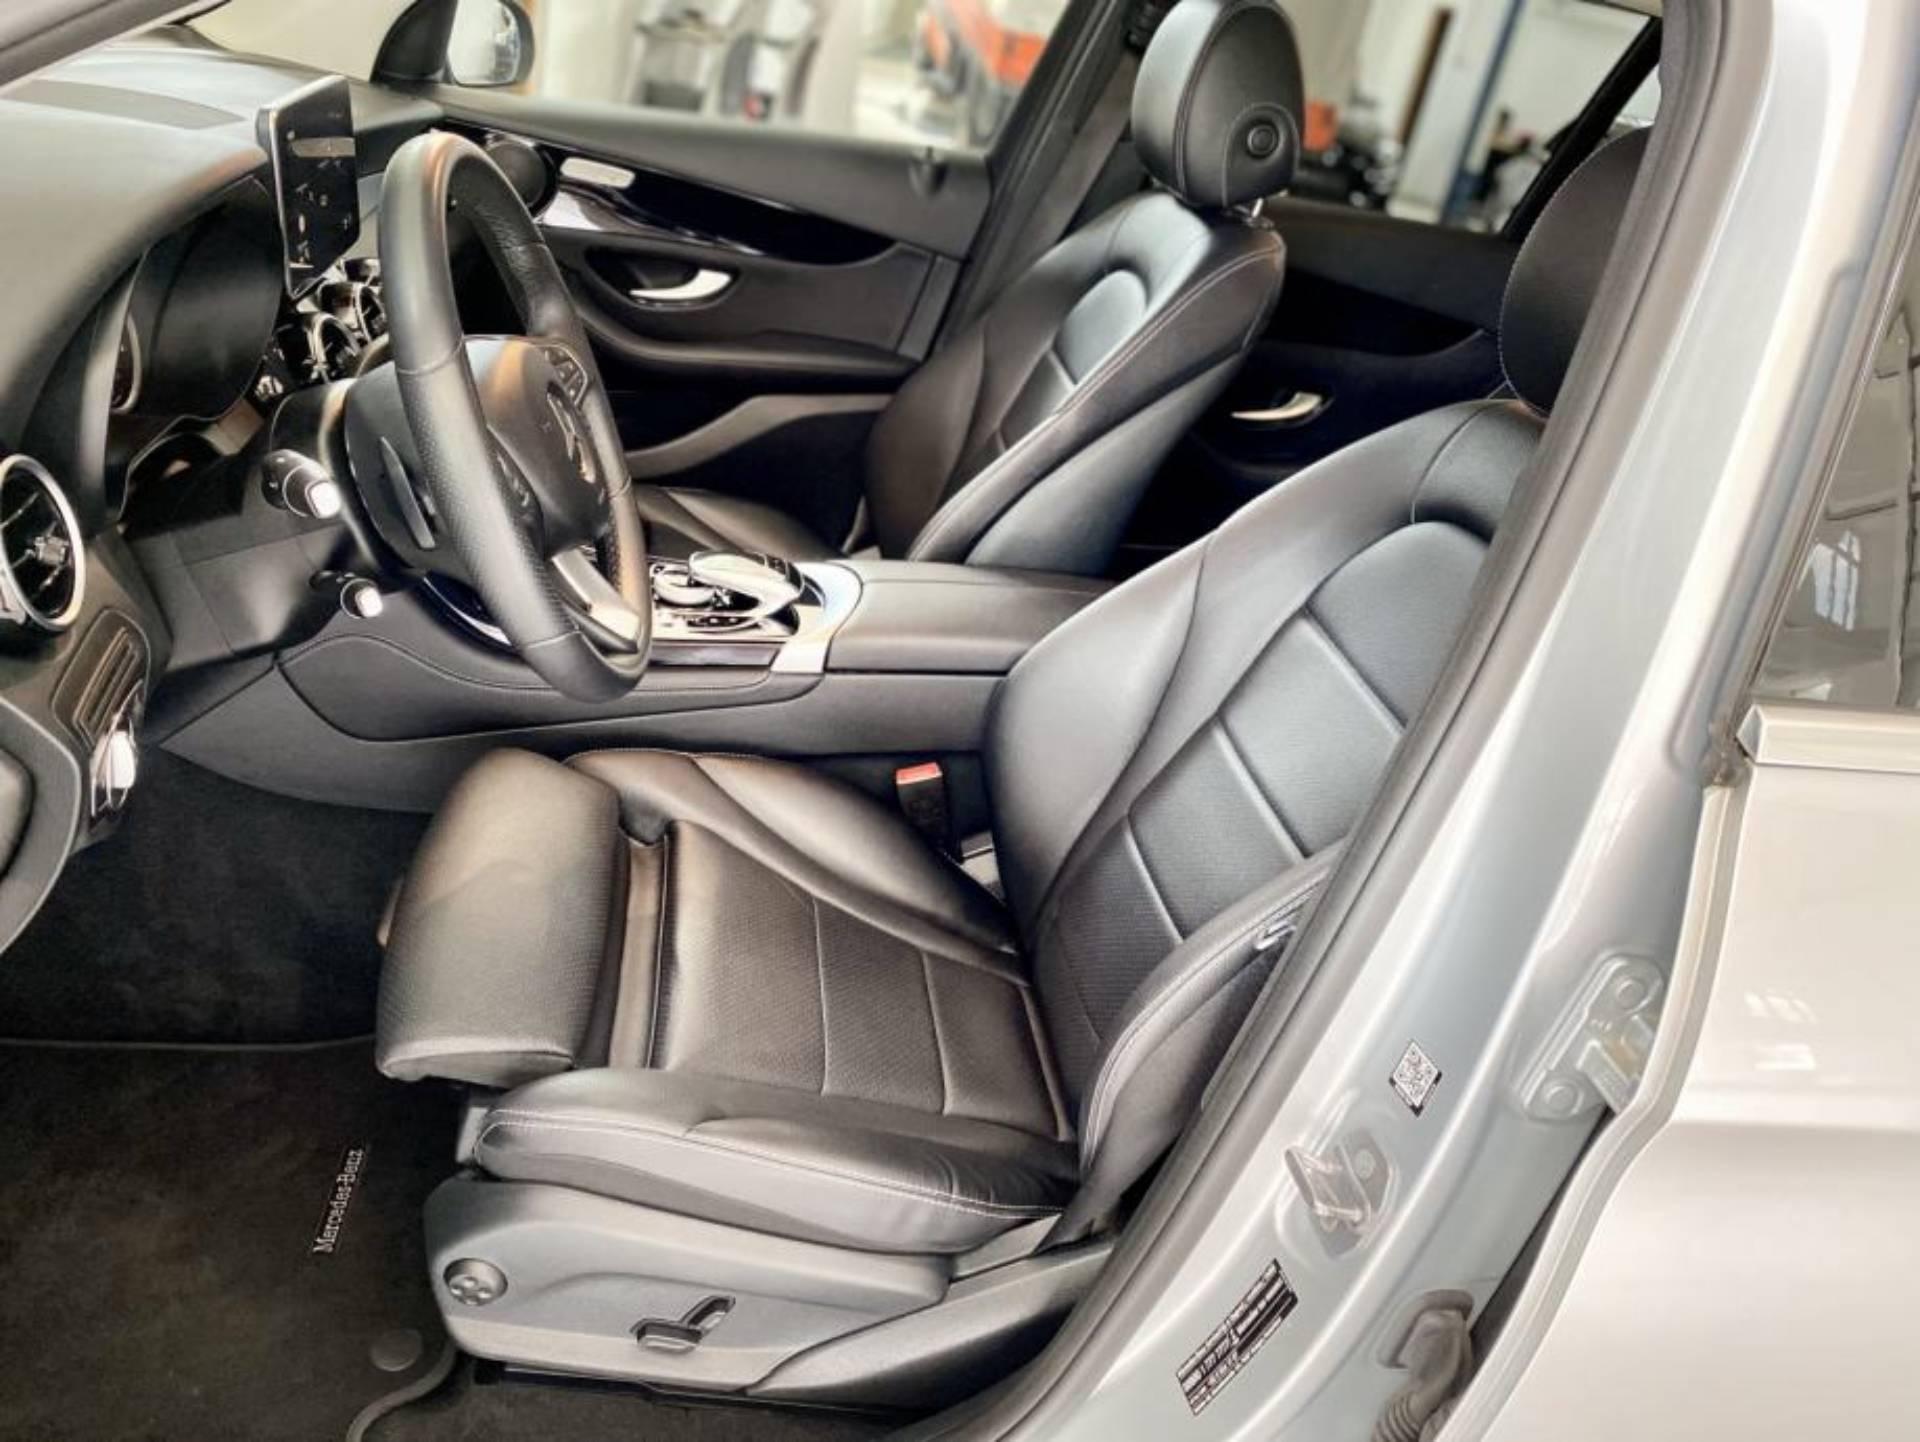 Mercedes Benz GLC 220 d EXCLUSIVE 9G